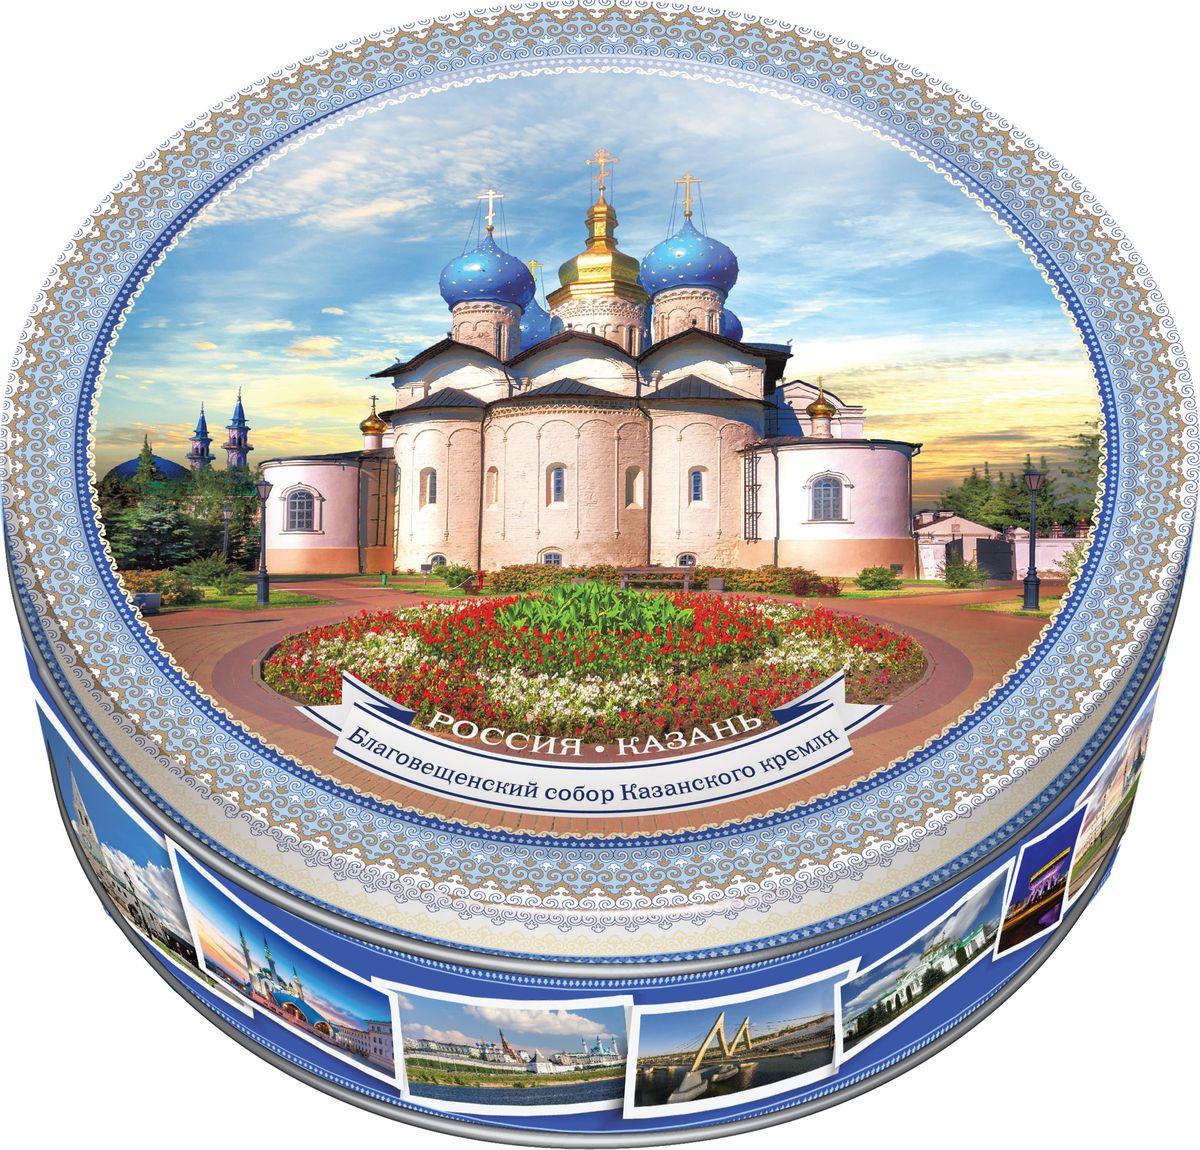 Monte Christo Казань печенье сдобное, 400 г